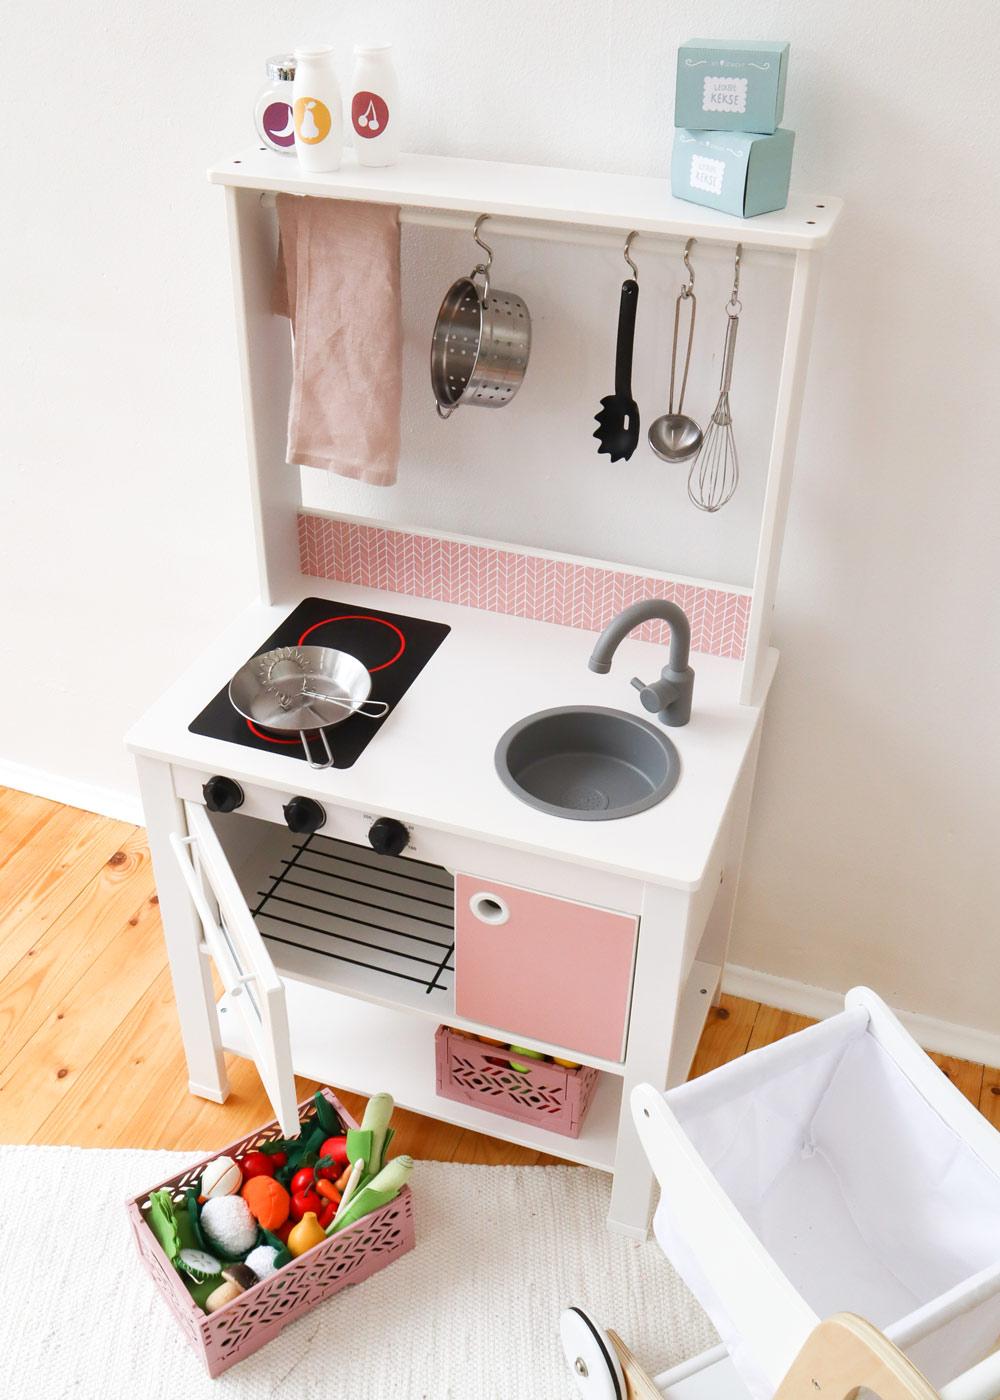 Ikea Spisig Kinderküche Skandig Rosa Gesamtansicht oben